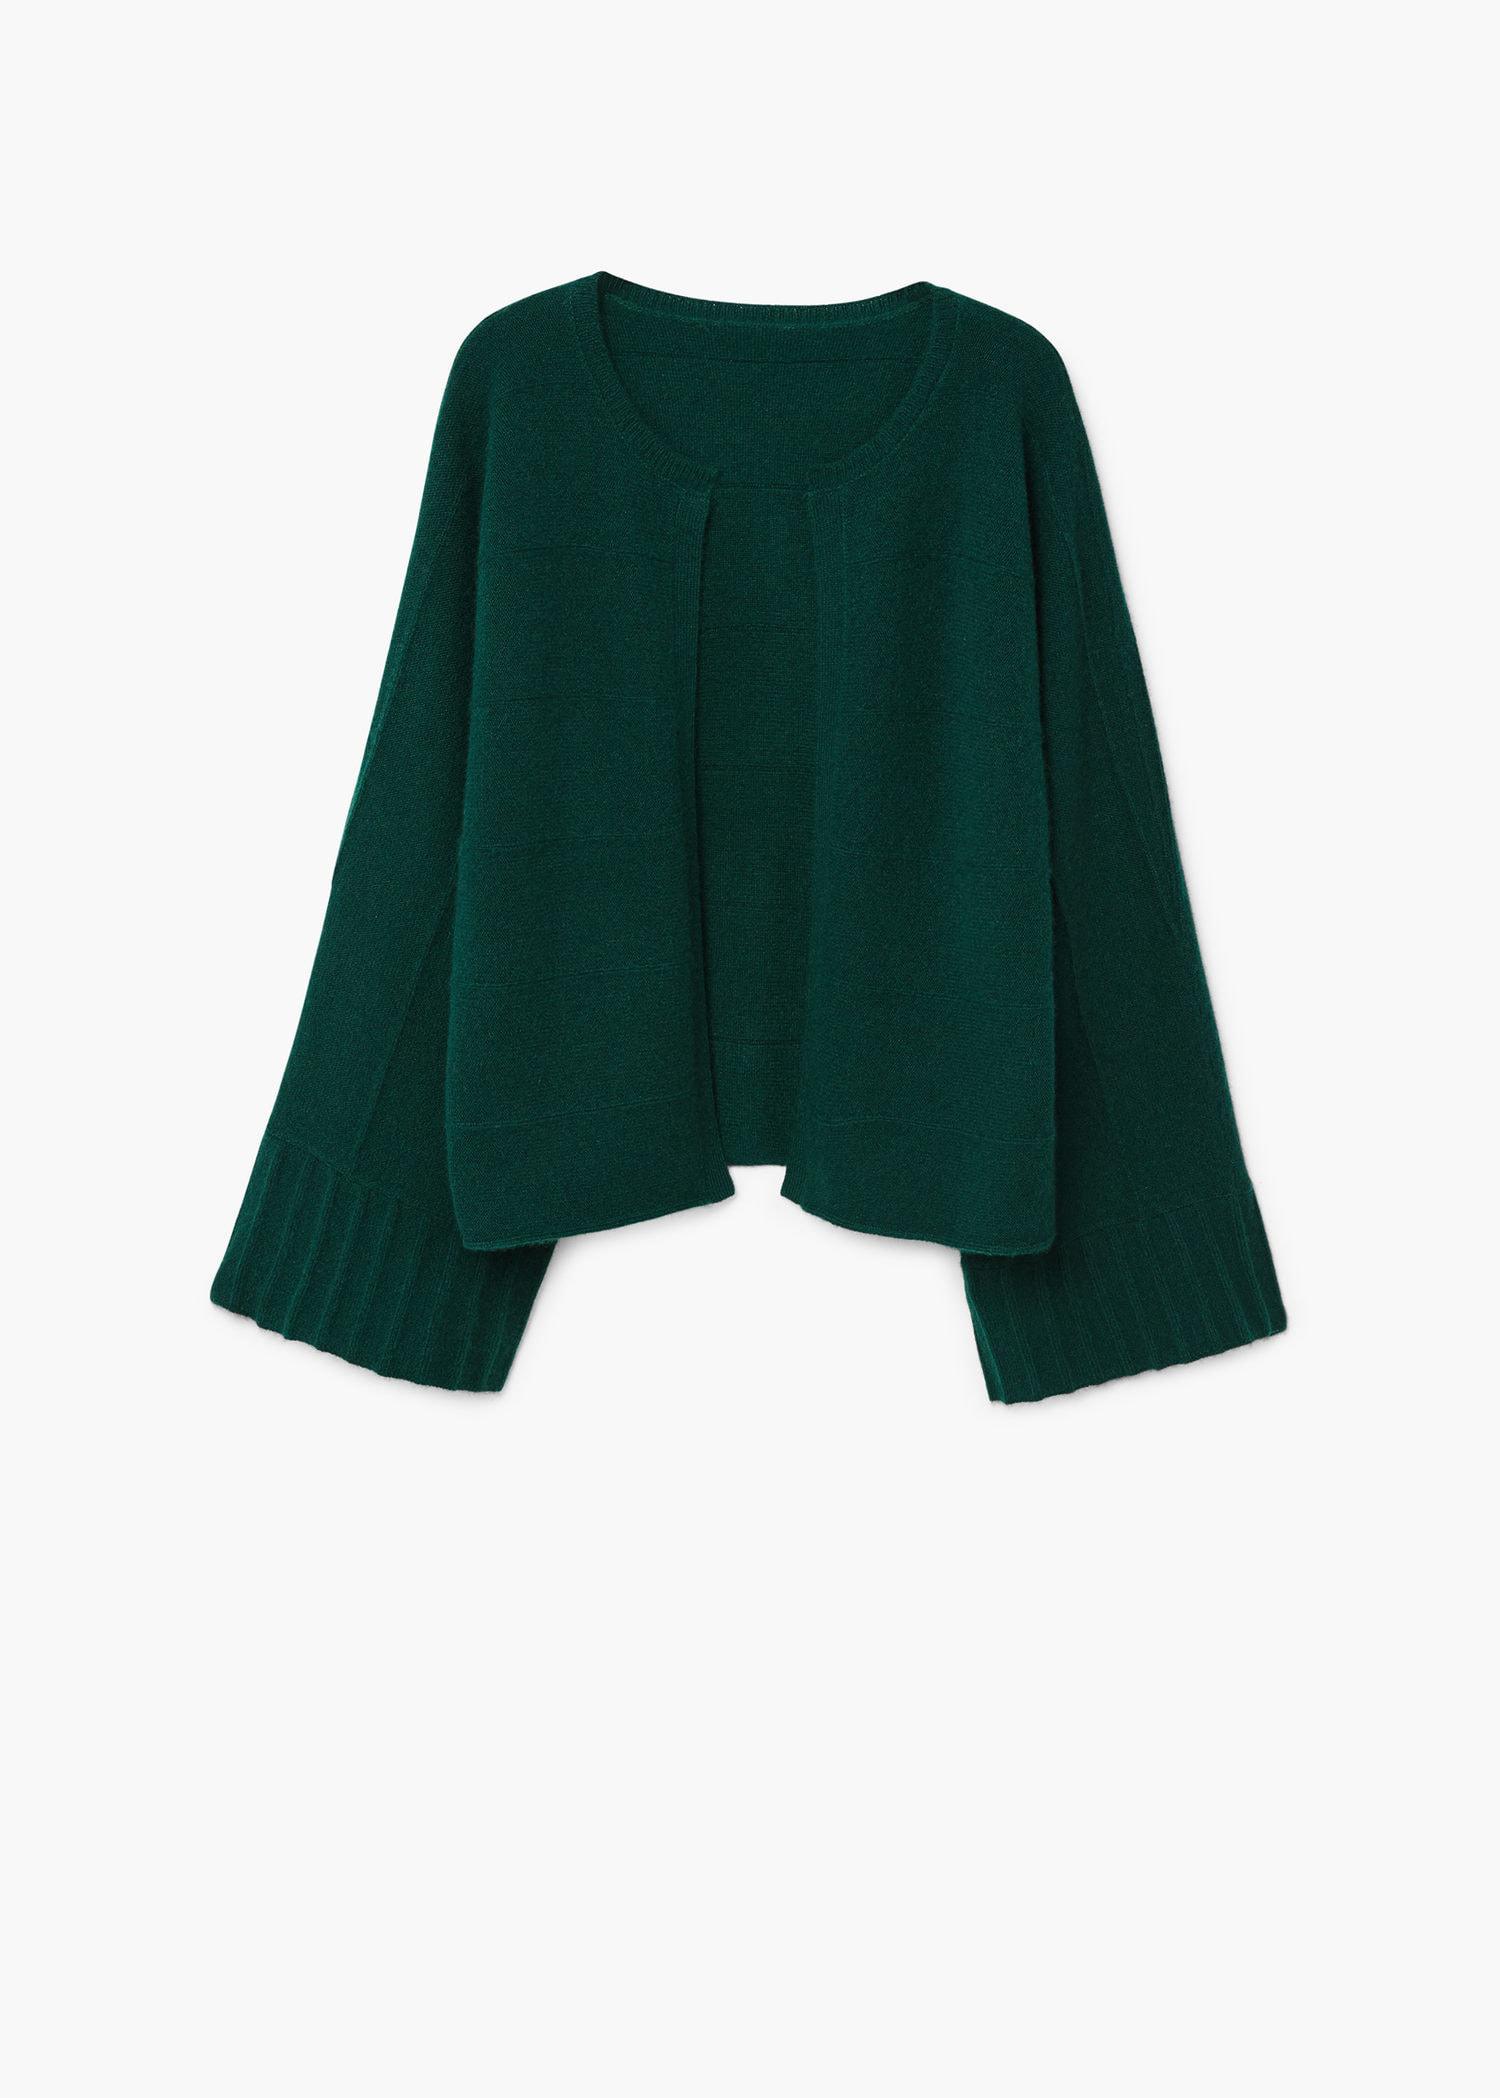 Mango 100% Cashmere Cardigan in Green | Lyst